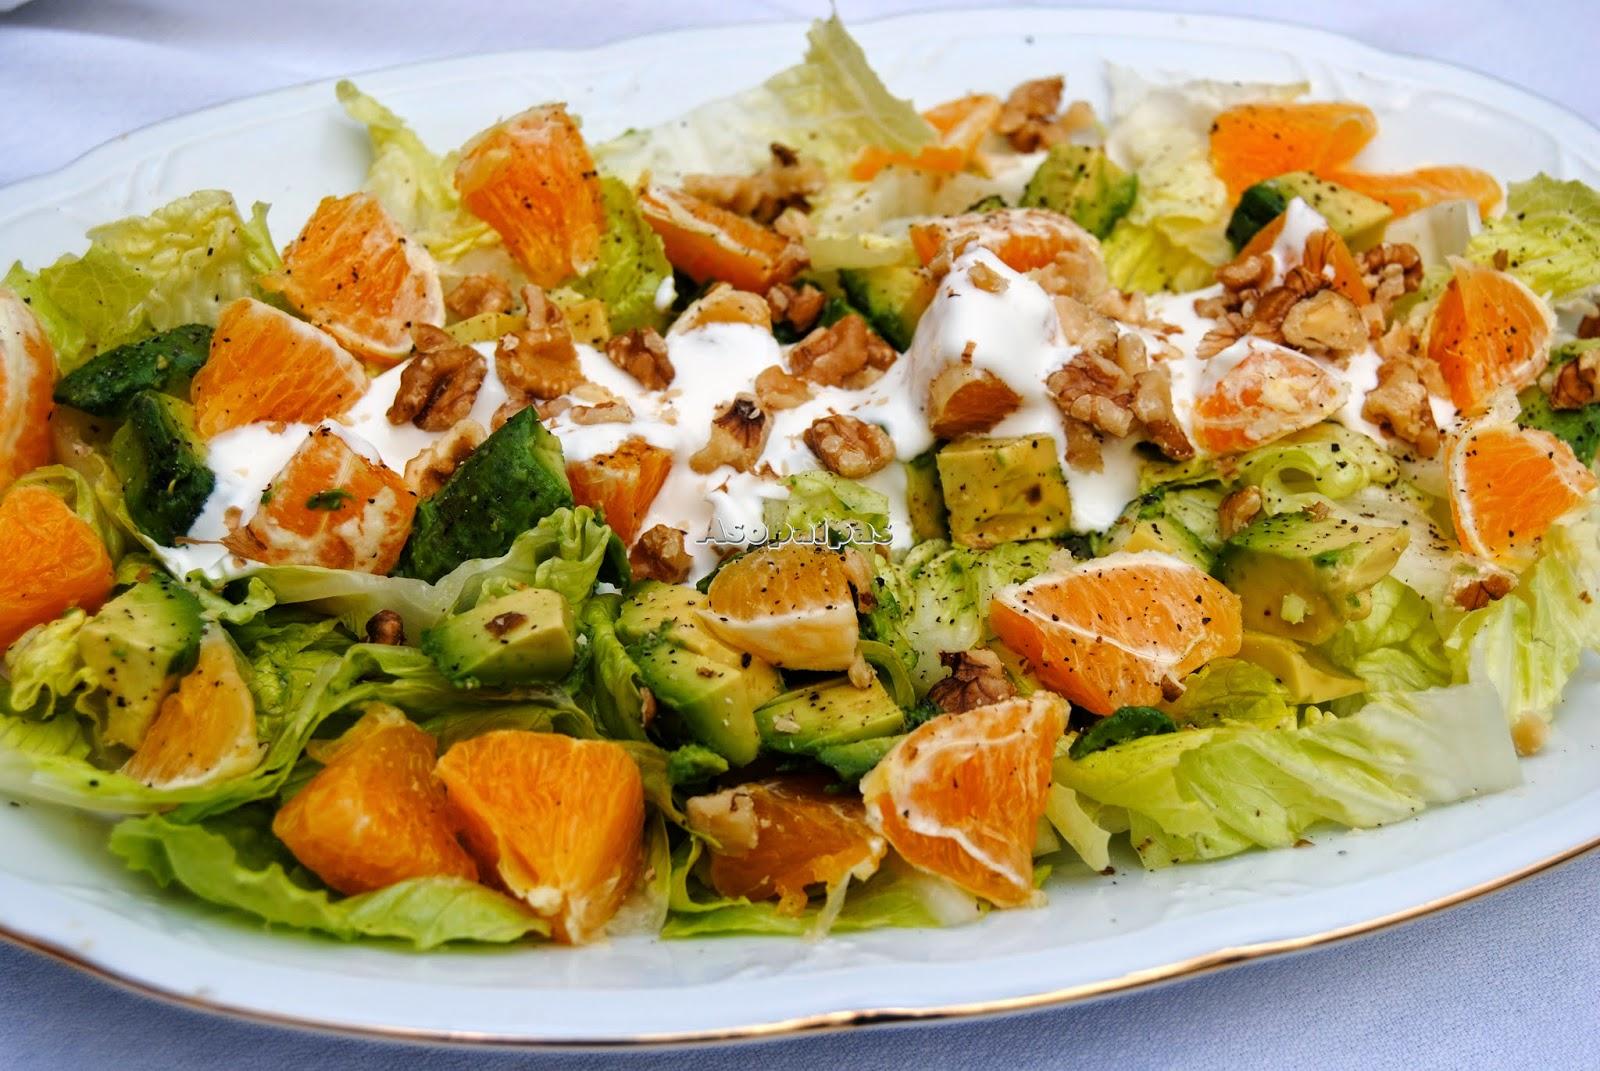 Ensalada California (California Salad)